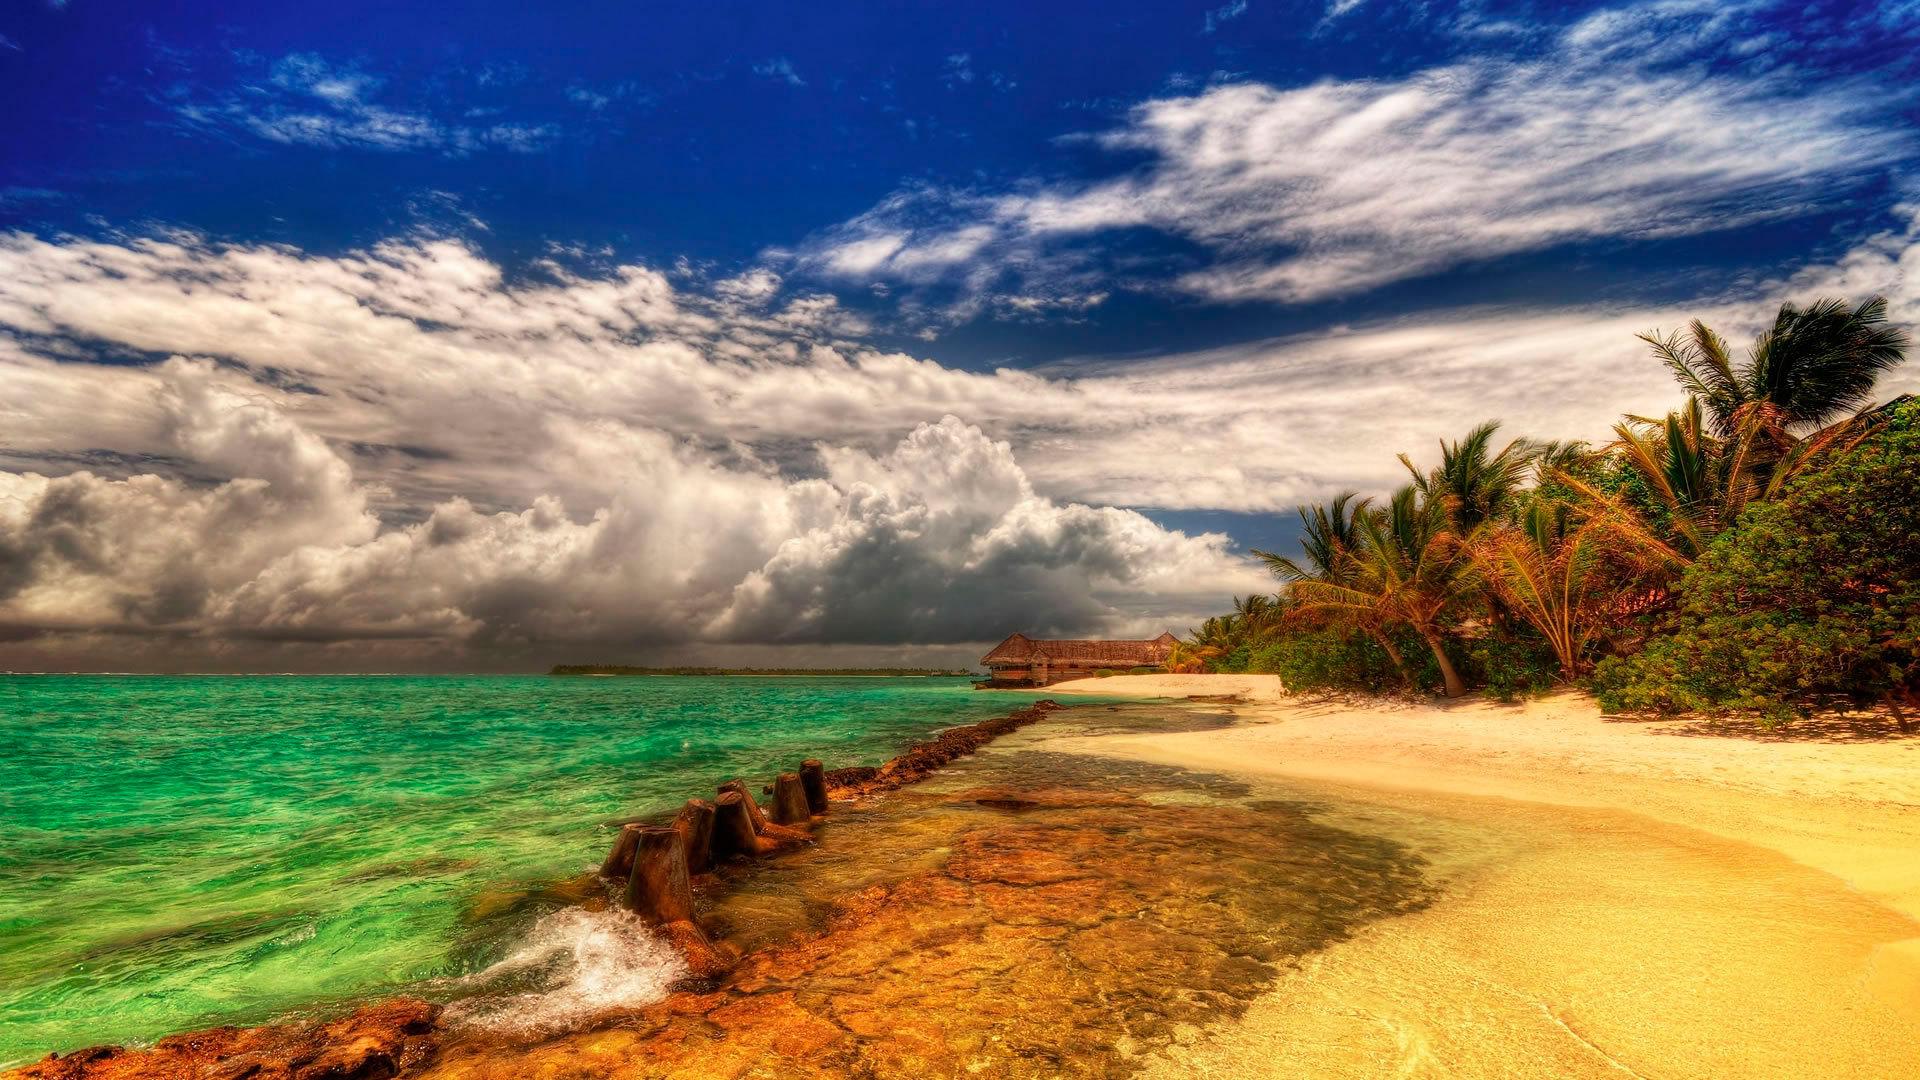 природа море побережье без регистрации